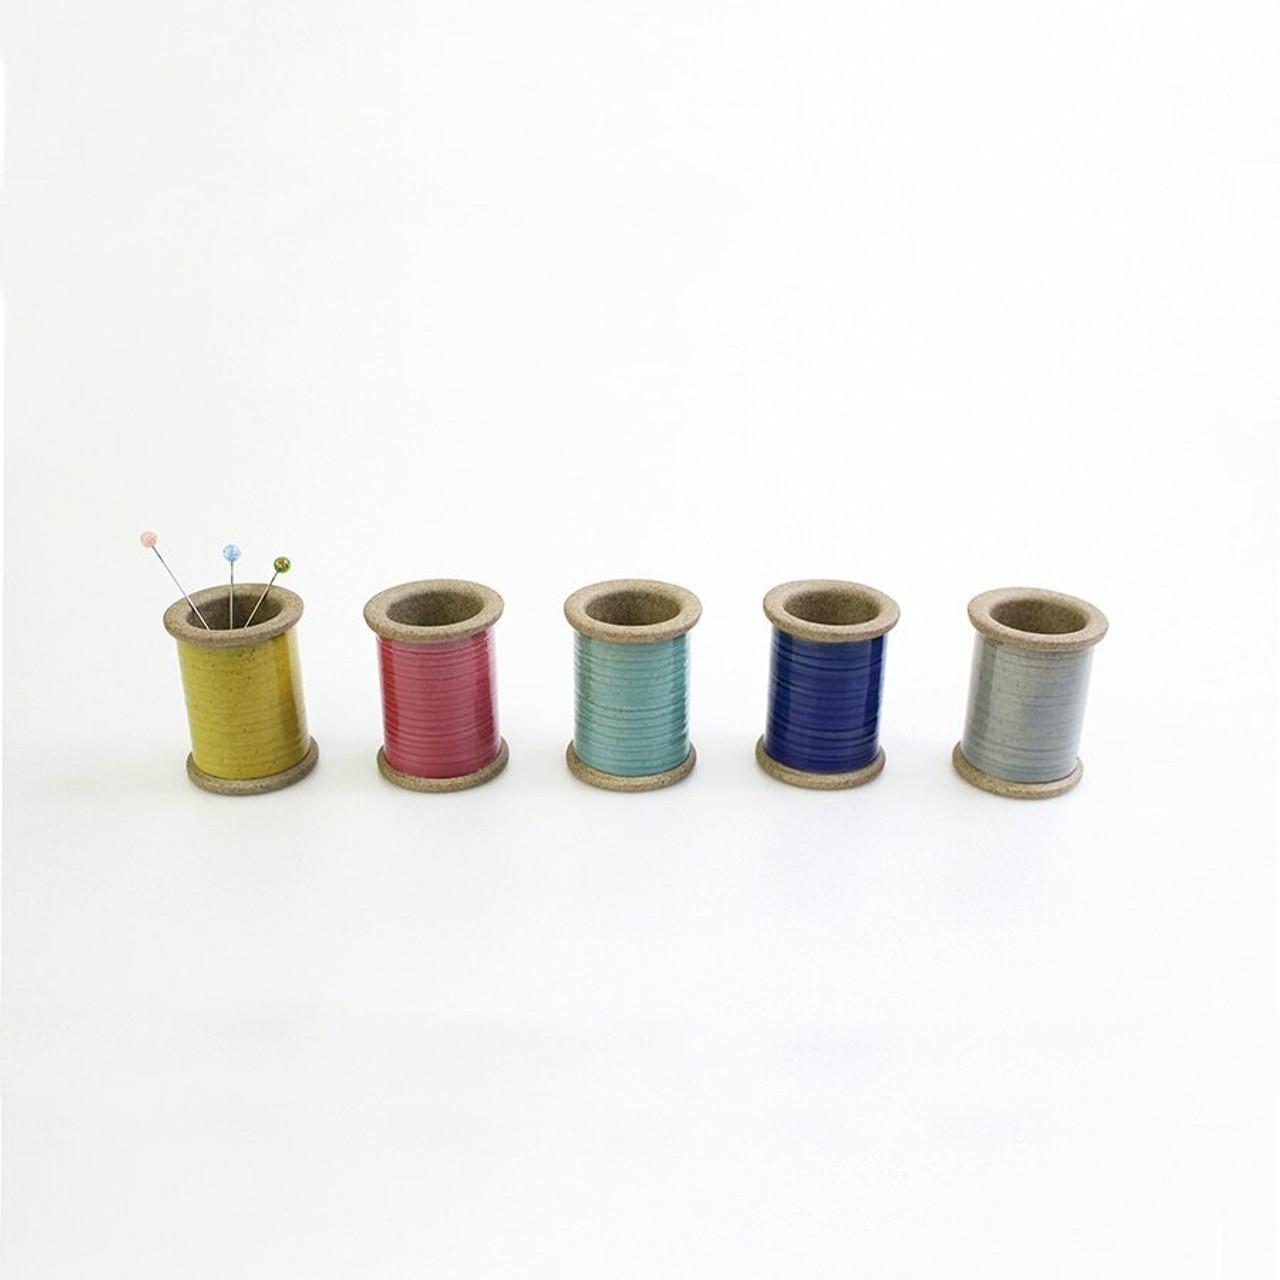 Cohana Ceramic Thread Spool